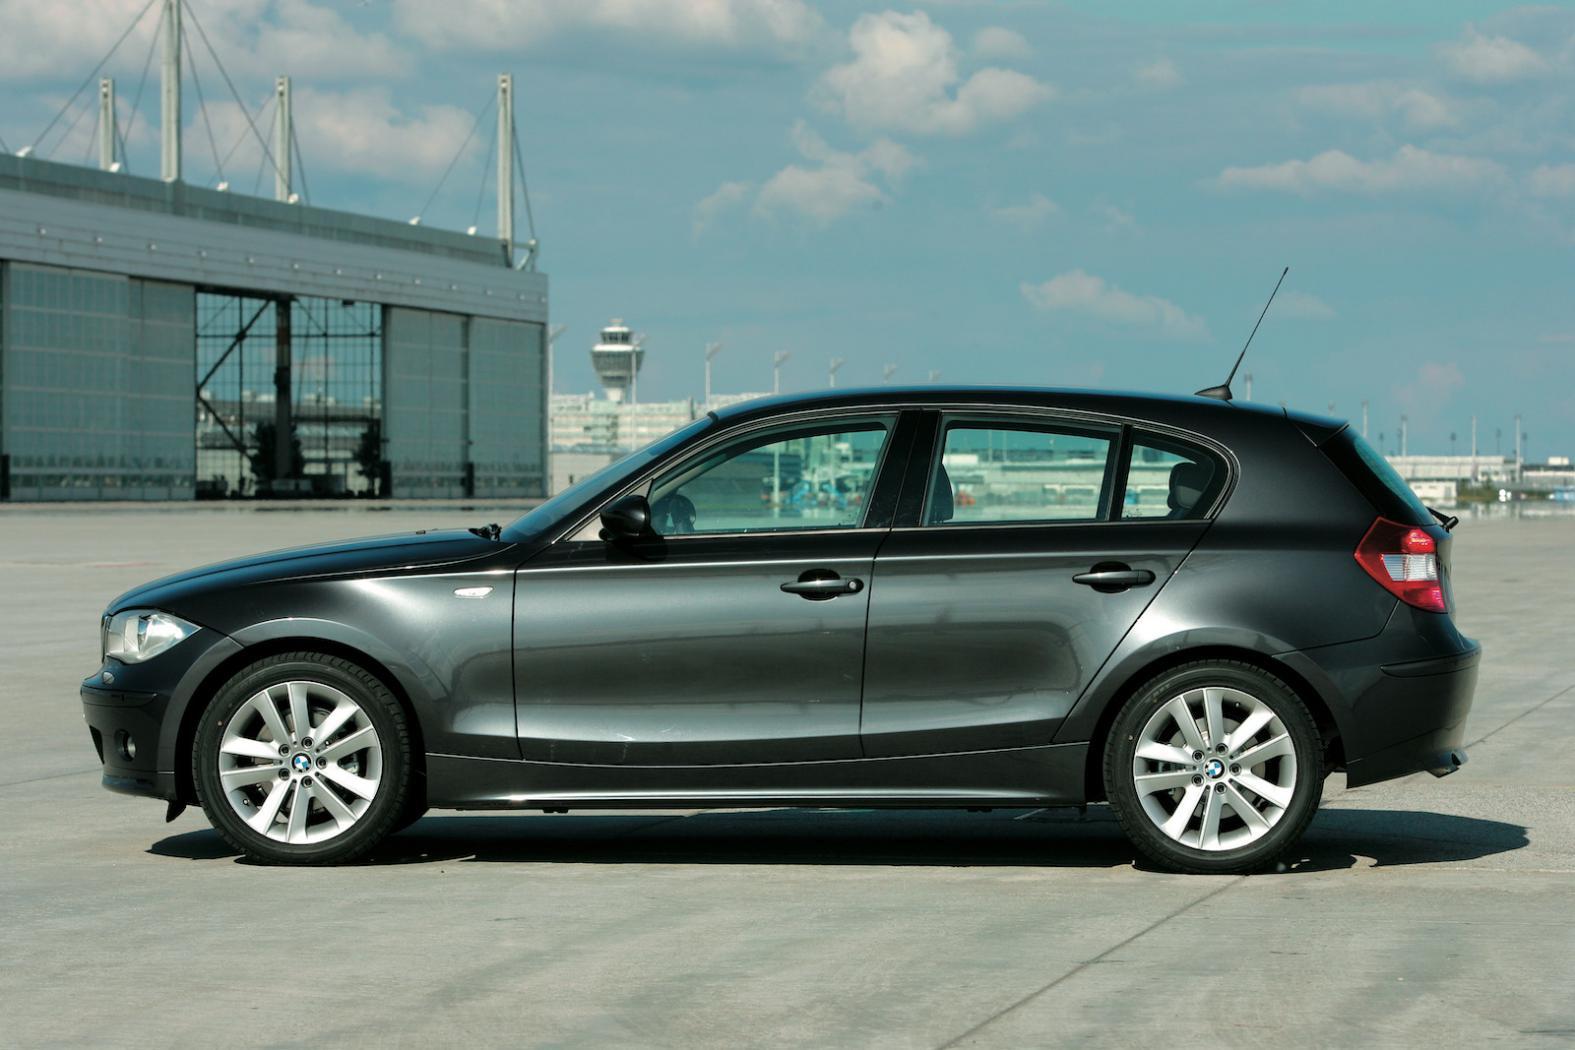 BMW-Serie1-E87-Casse-chaine-distribution-4.jpeg